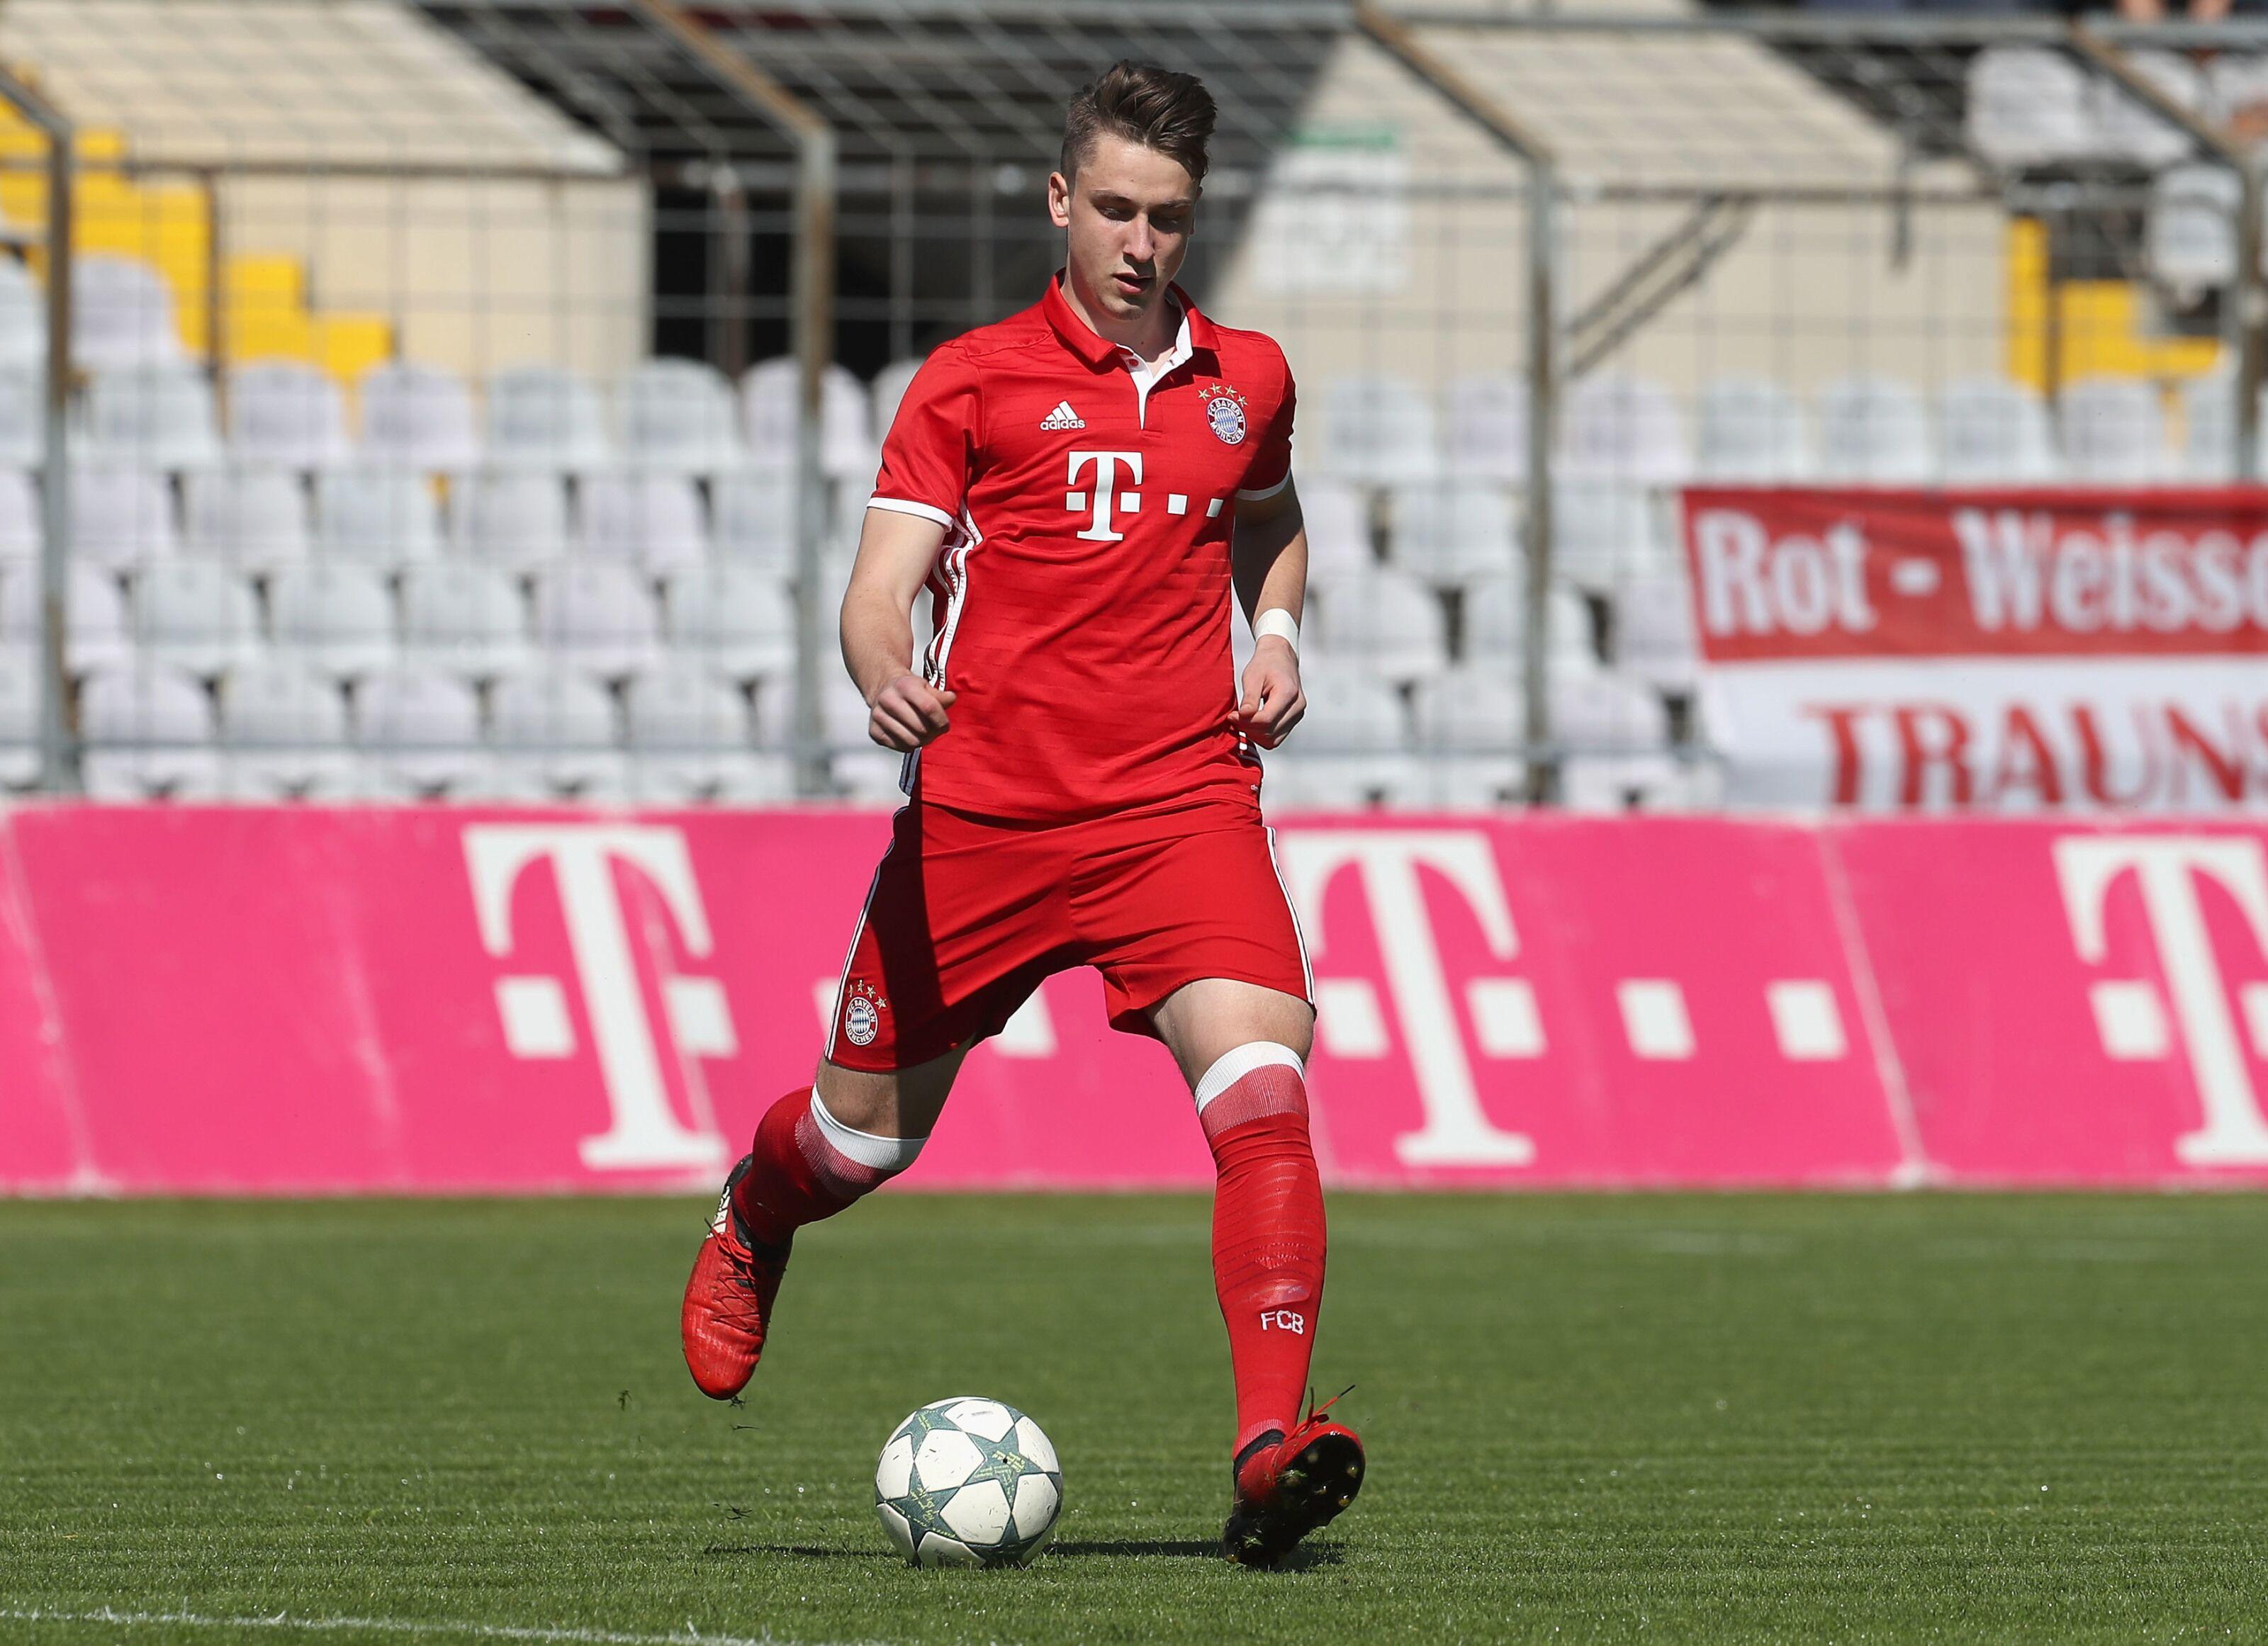 Bayern Munich extends young midfielder's contract